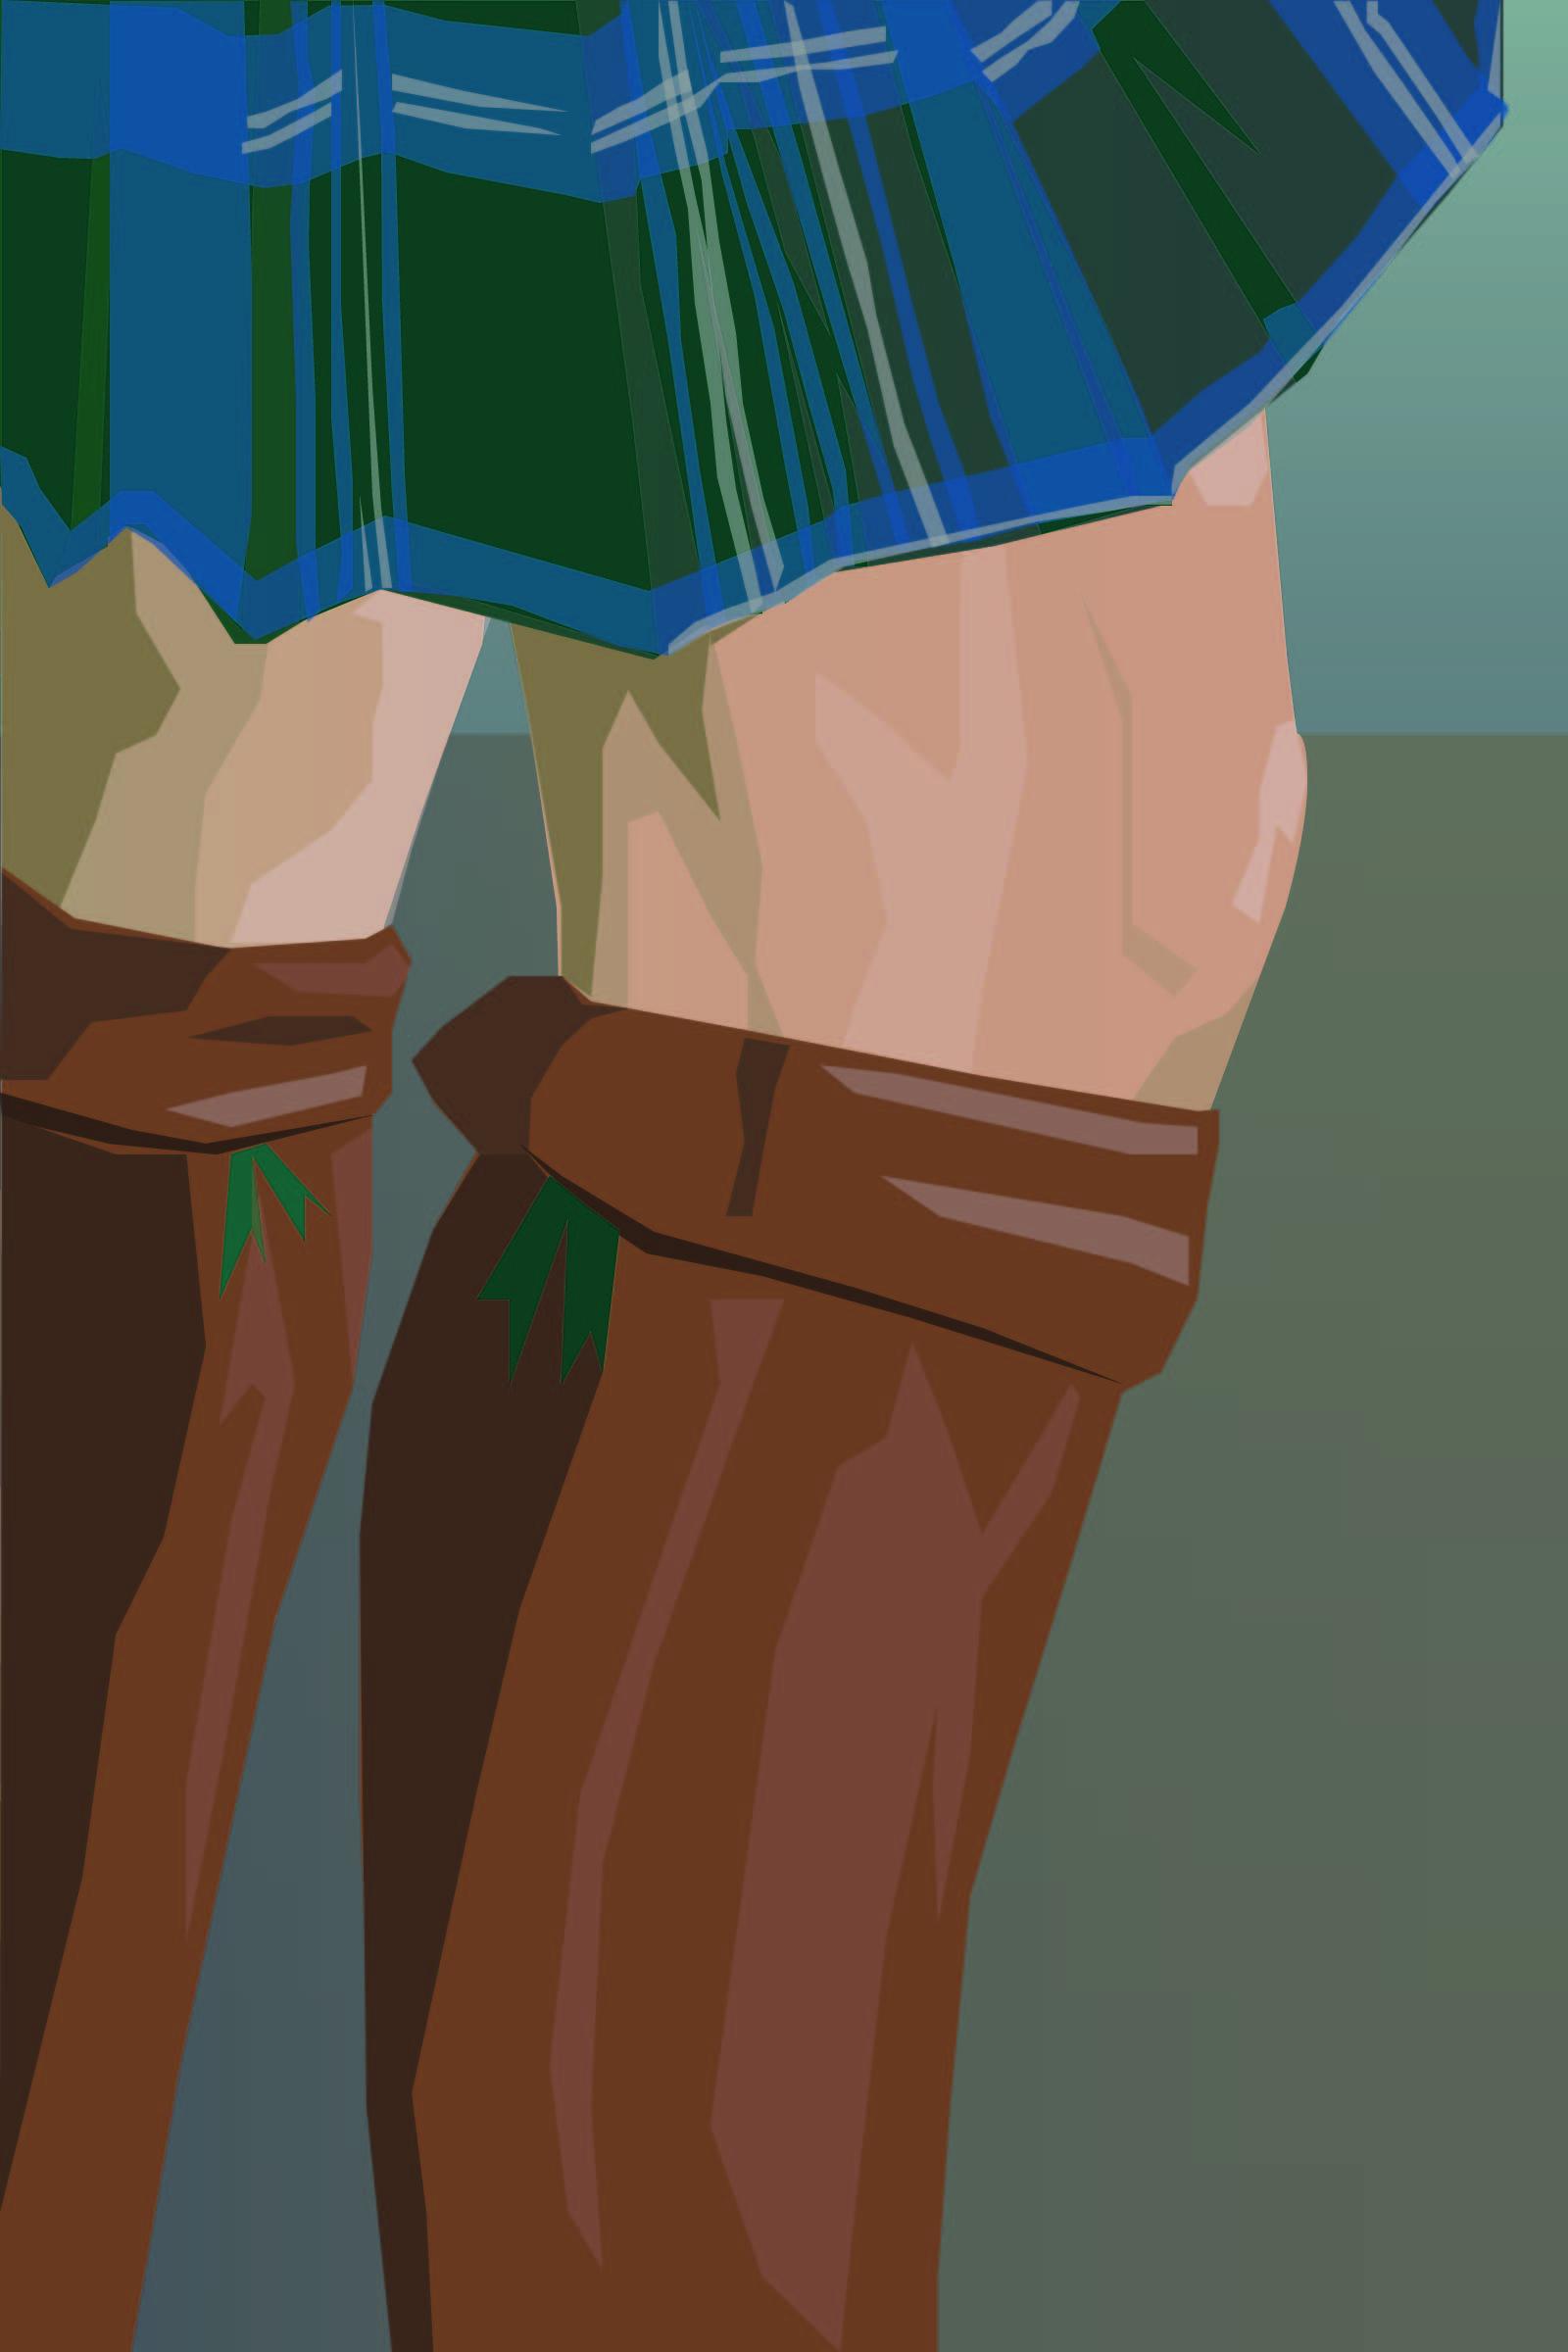 Daleroch blue and green kilt tartan, knees, and leather boots.  Kavordian Library.  Fyskar.